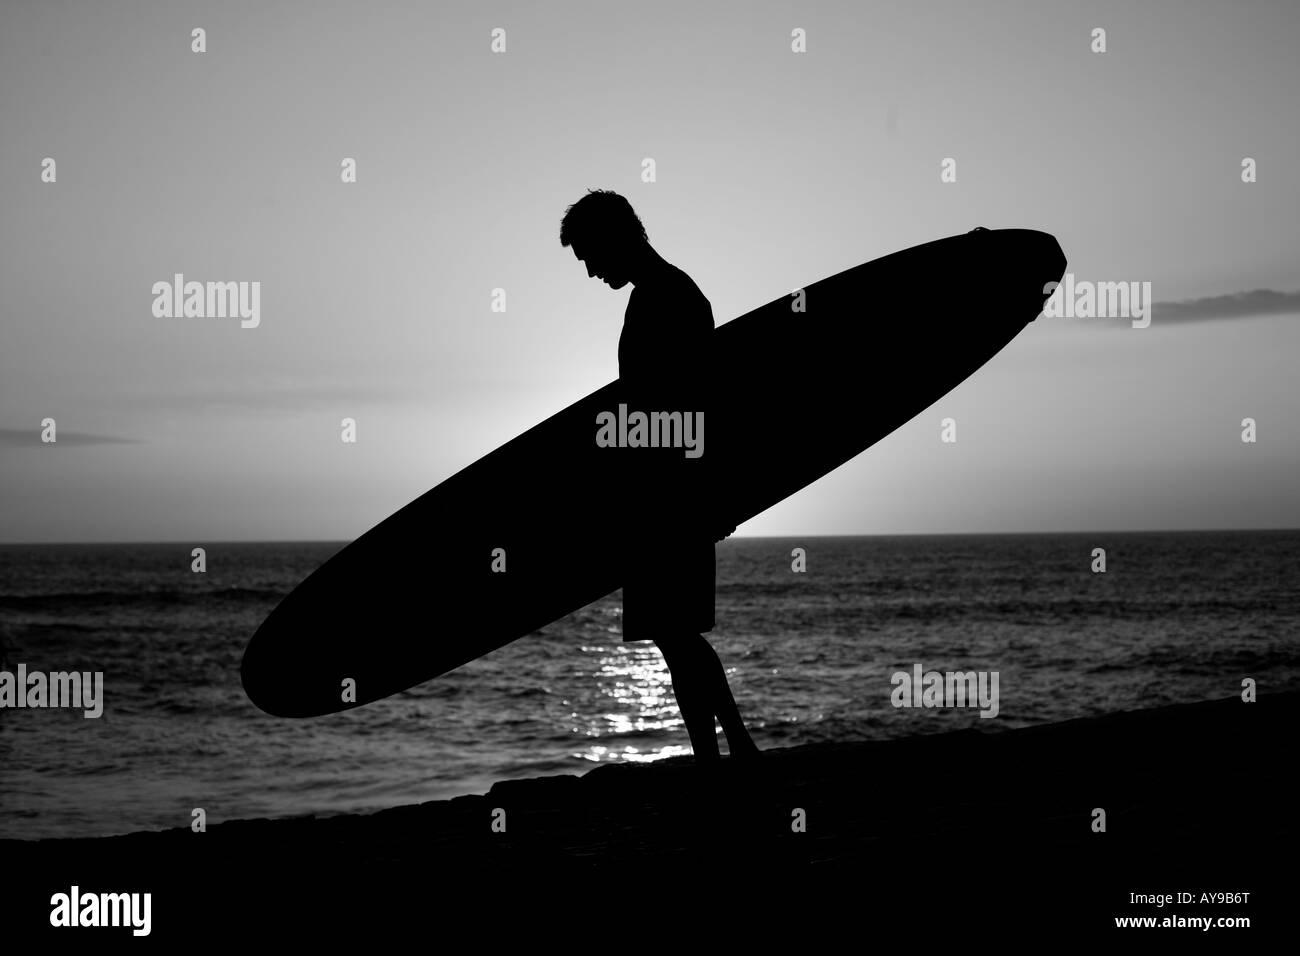 SURFING LIFESTYLE - Stock Image